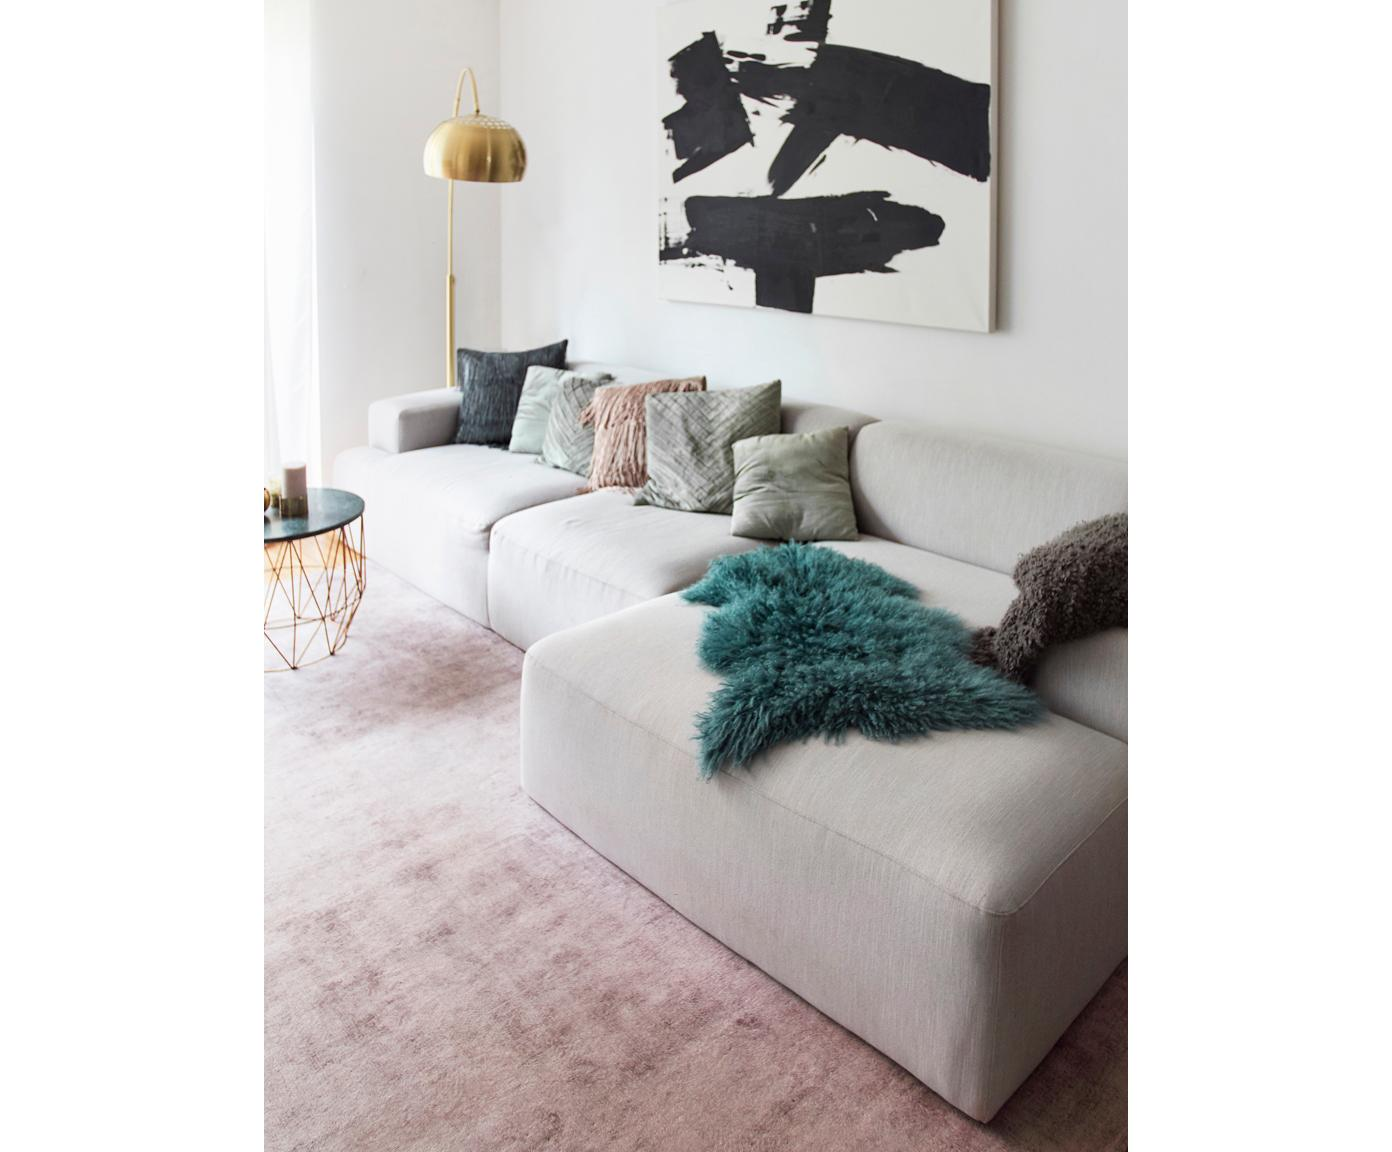 Hoekbank Melva (4-zits), Bekleding: polyester, Frame: massief grenenhout, spaan, Poten: grenenhout, Geweven stof lichtgrijs, B 319 x D 144 cm